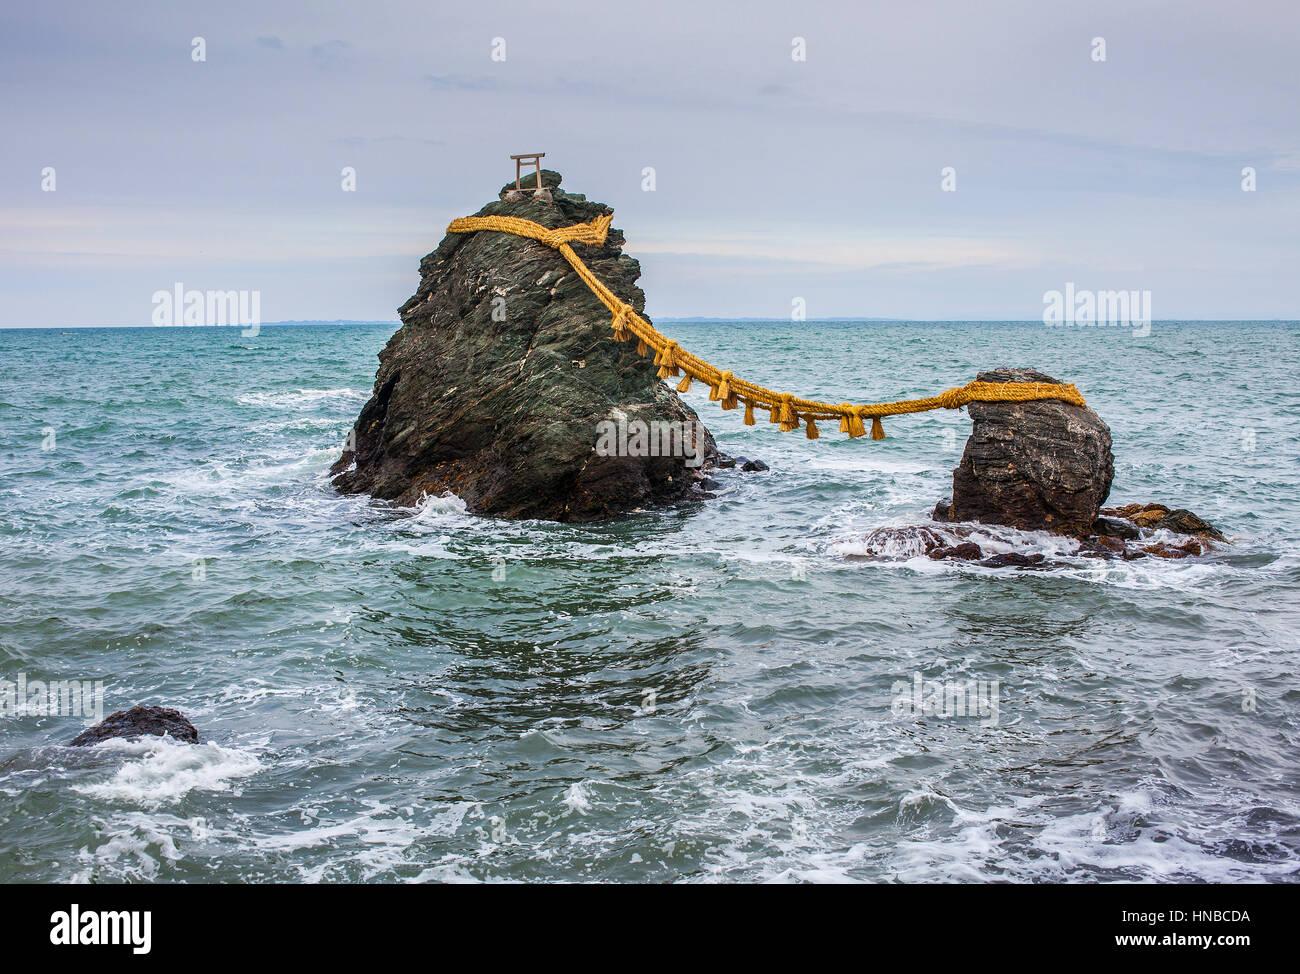 Meoto-Iwa, Wedded Rocks, off the coast of Futamigaura Beach, Futami Town on the in Mie Prefecture, Japan. - Stock Image